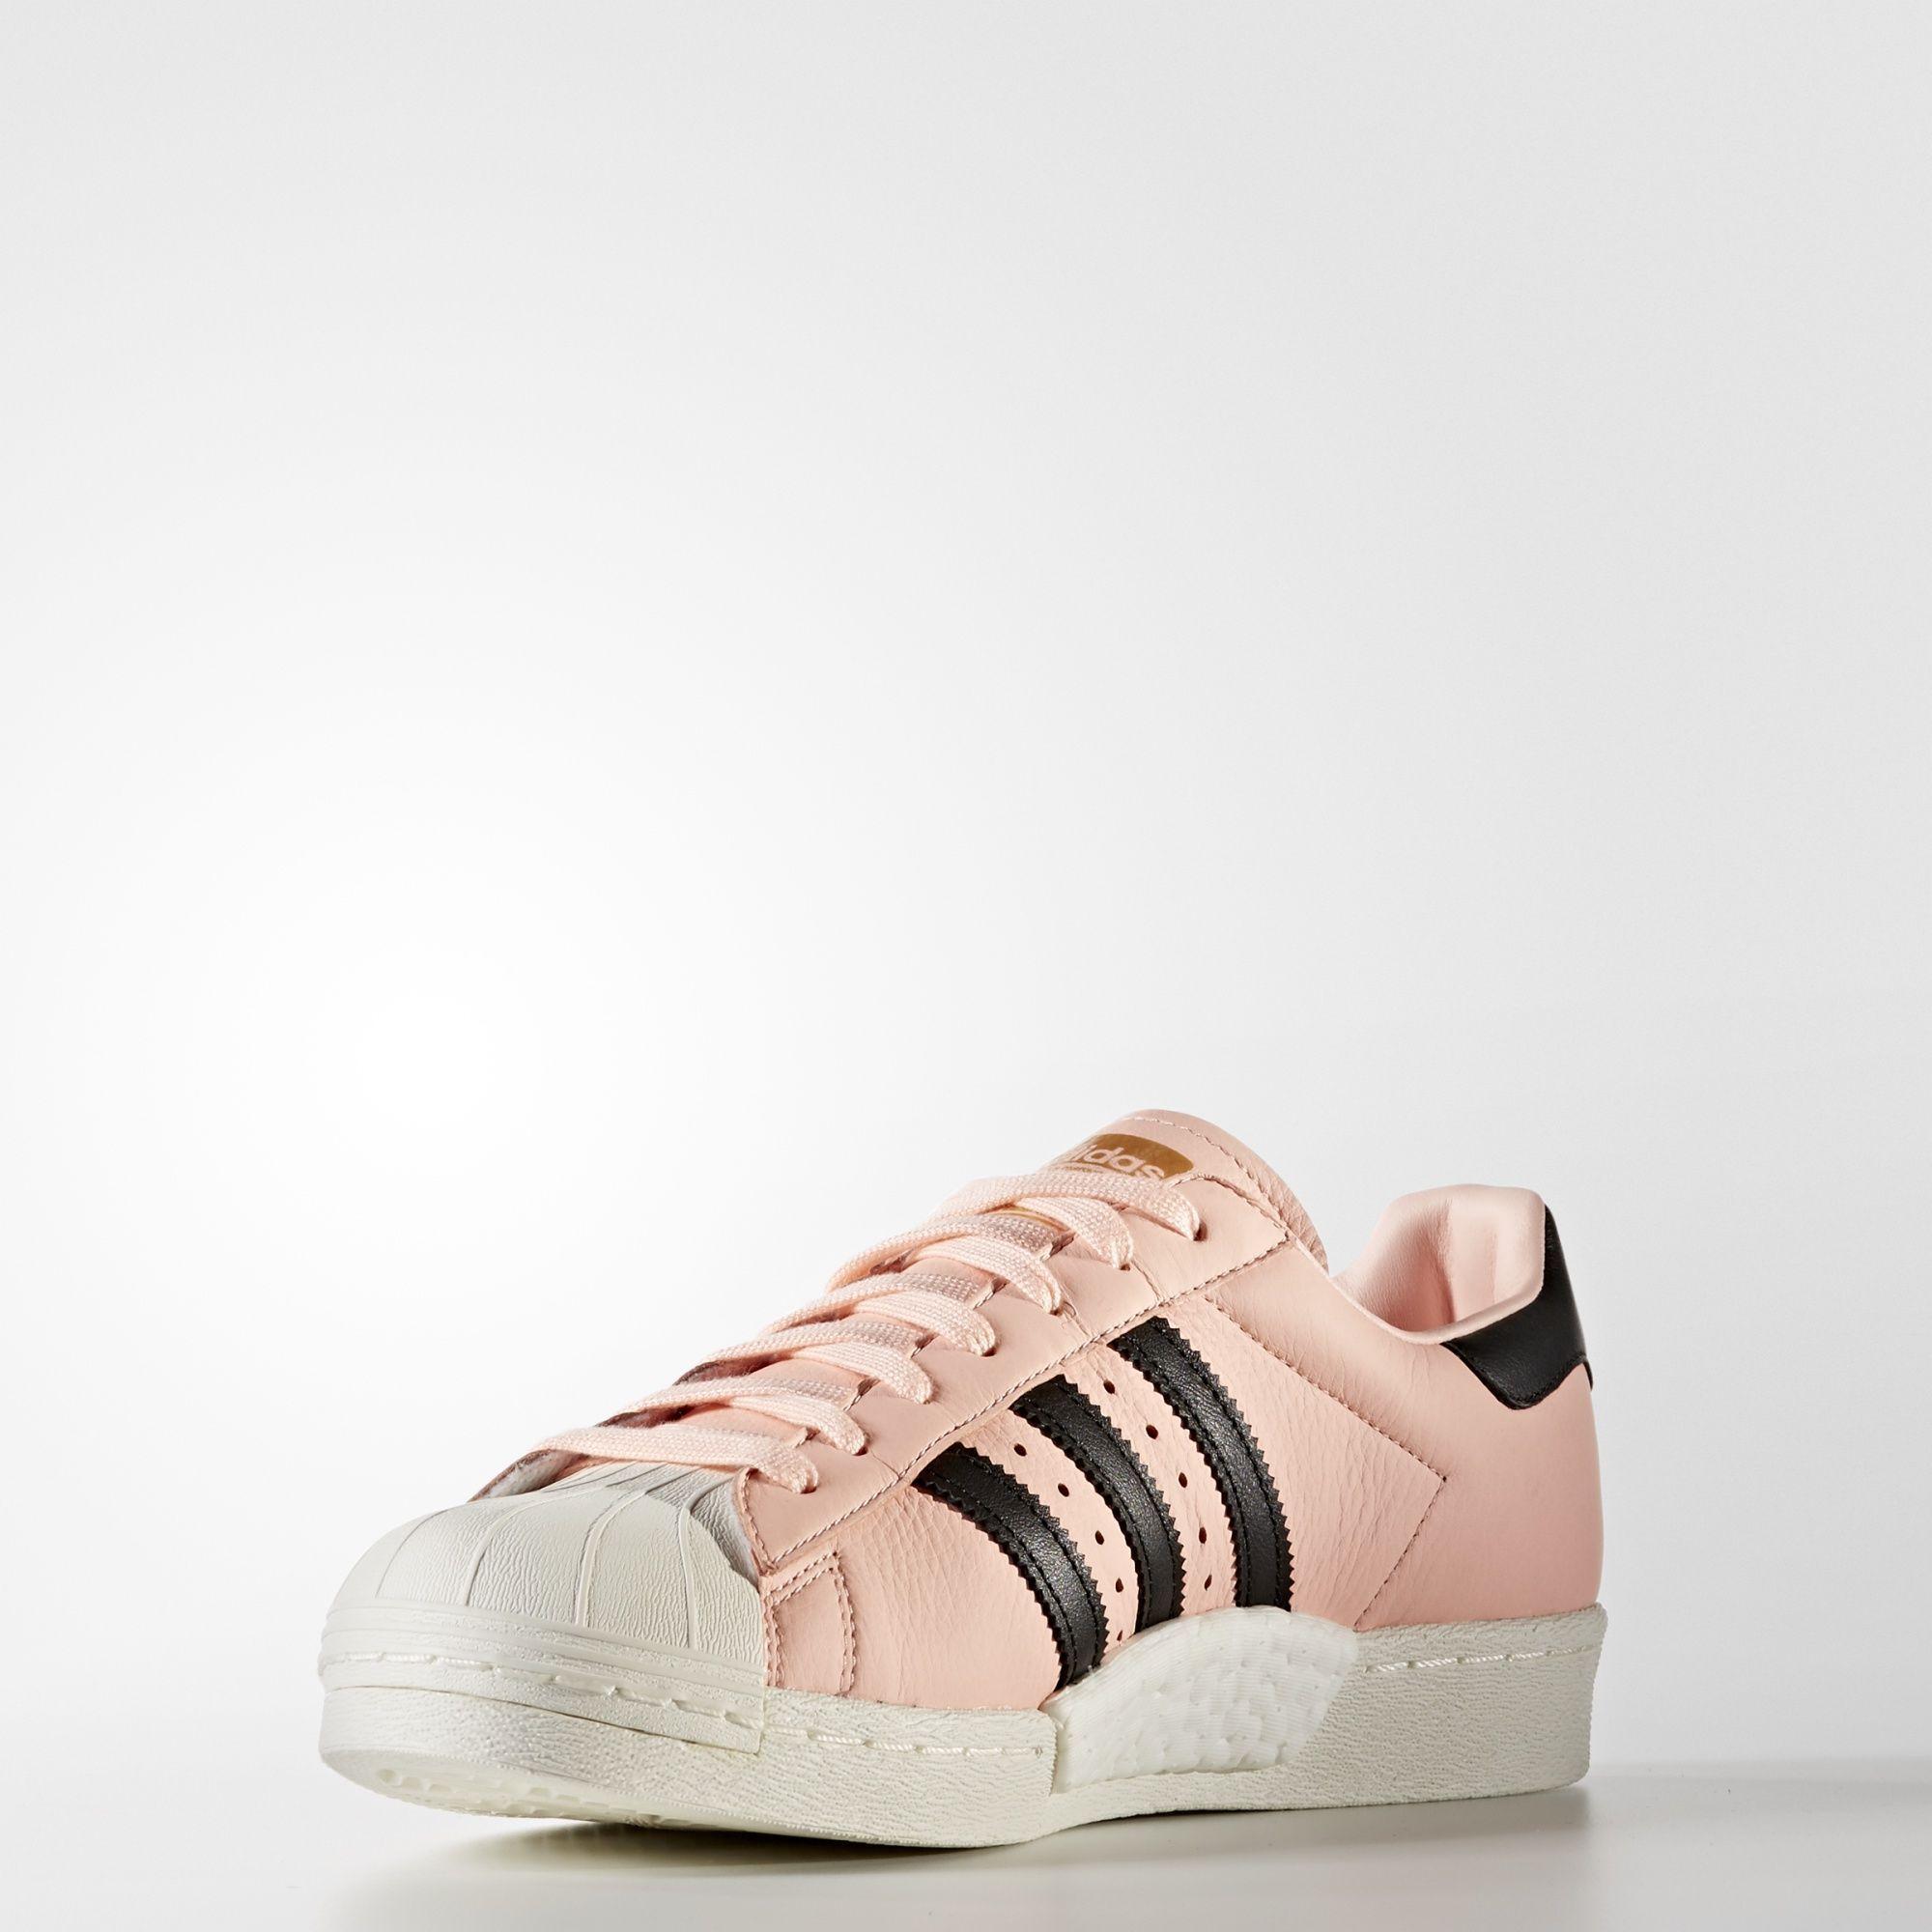 92b7115ddff3 Pin by Mi Mi on Sneakers to buy